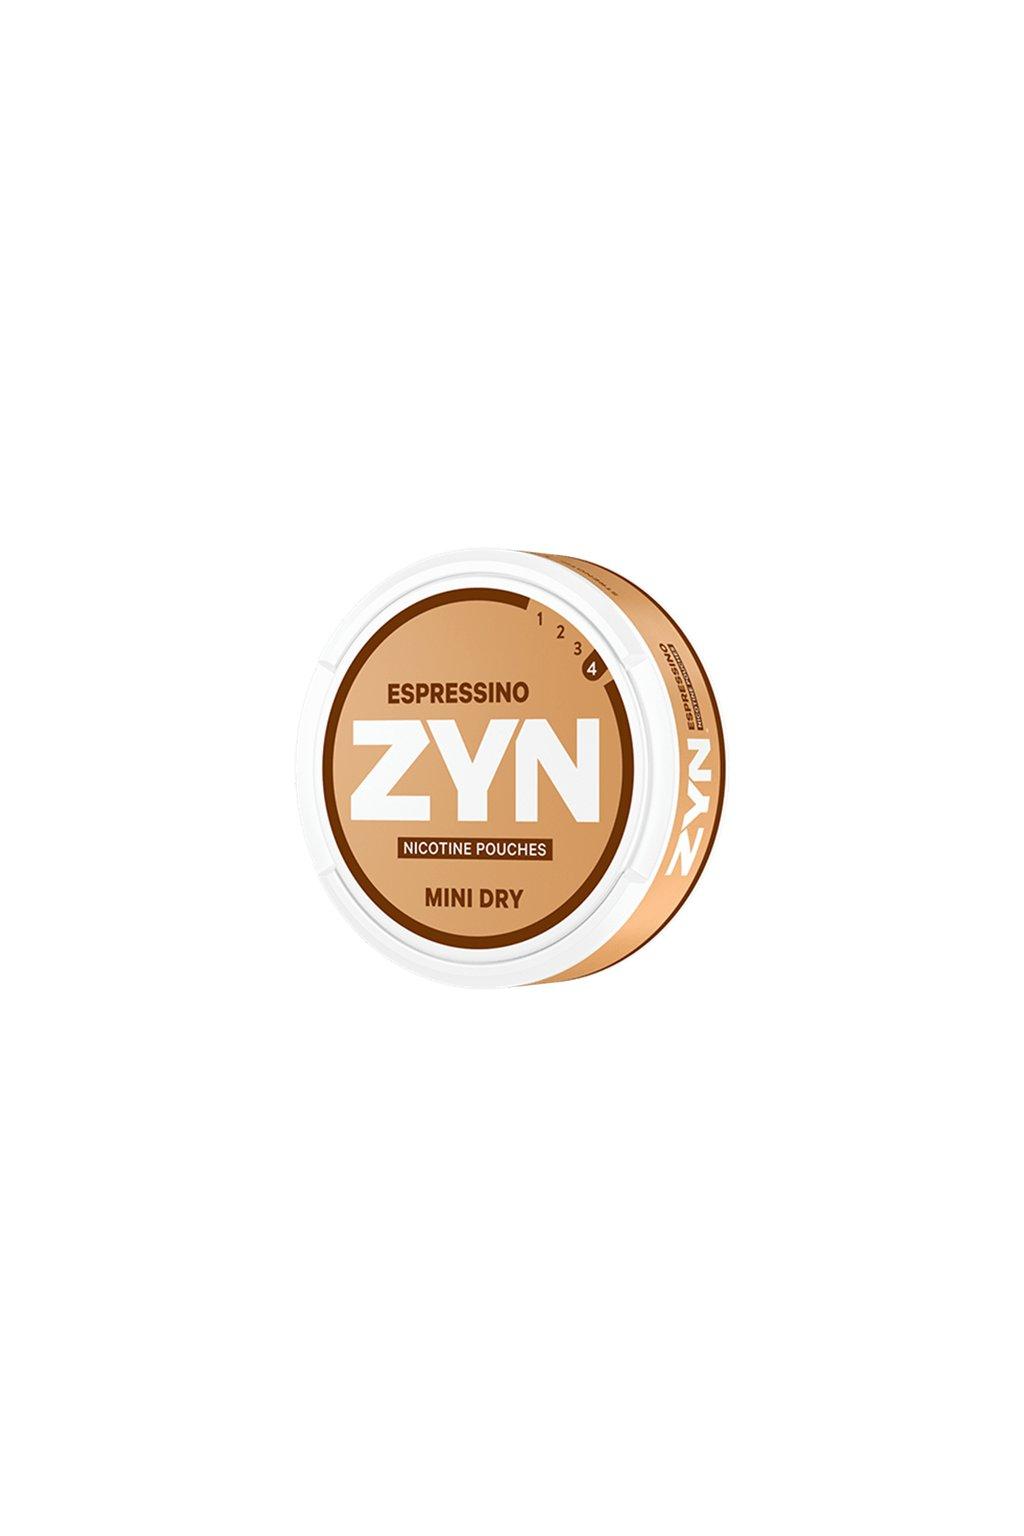 zyn espressino mini strong nikotinove sacky nordiction